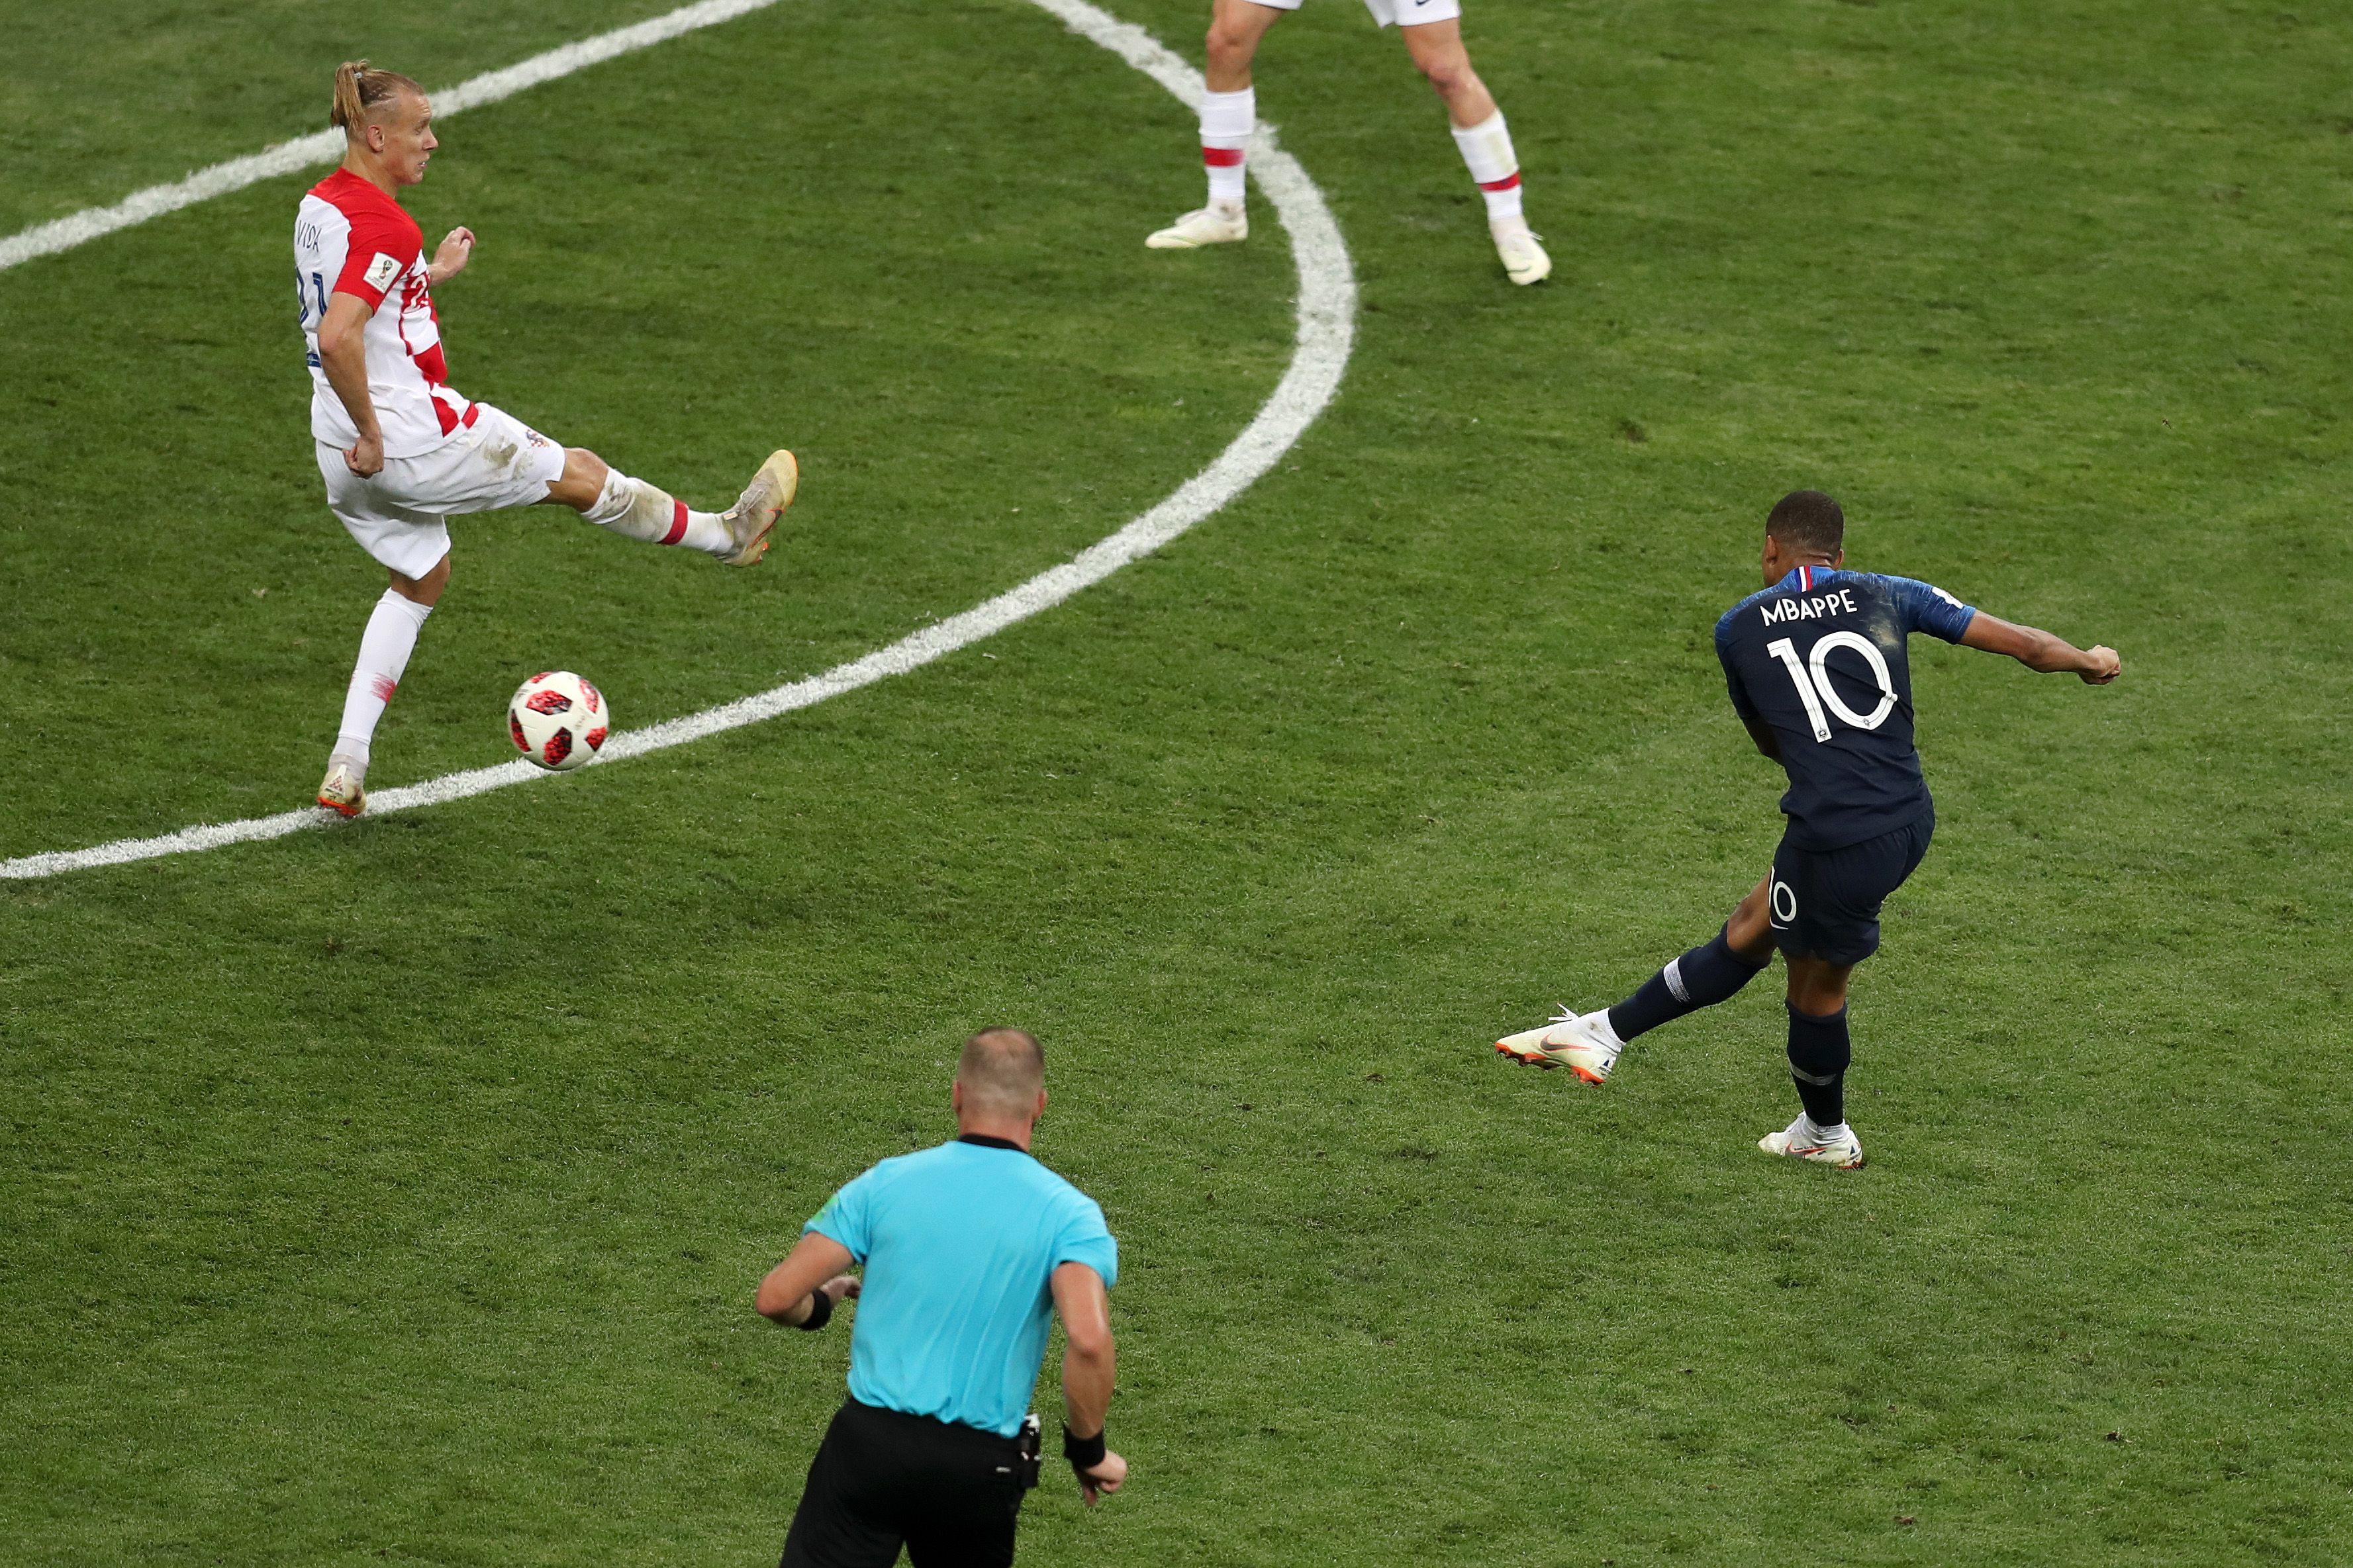 Final Match Fifa World Cup 2018 France Won The World Cup 2018 France Beat The Croatia 4 2 In World Cup 2018 Fifa World Cup Fifa World Cup